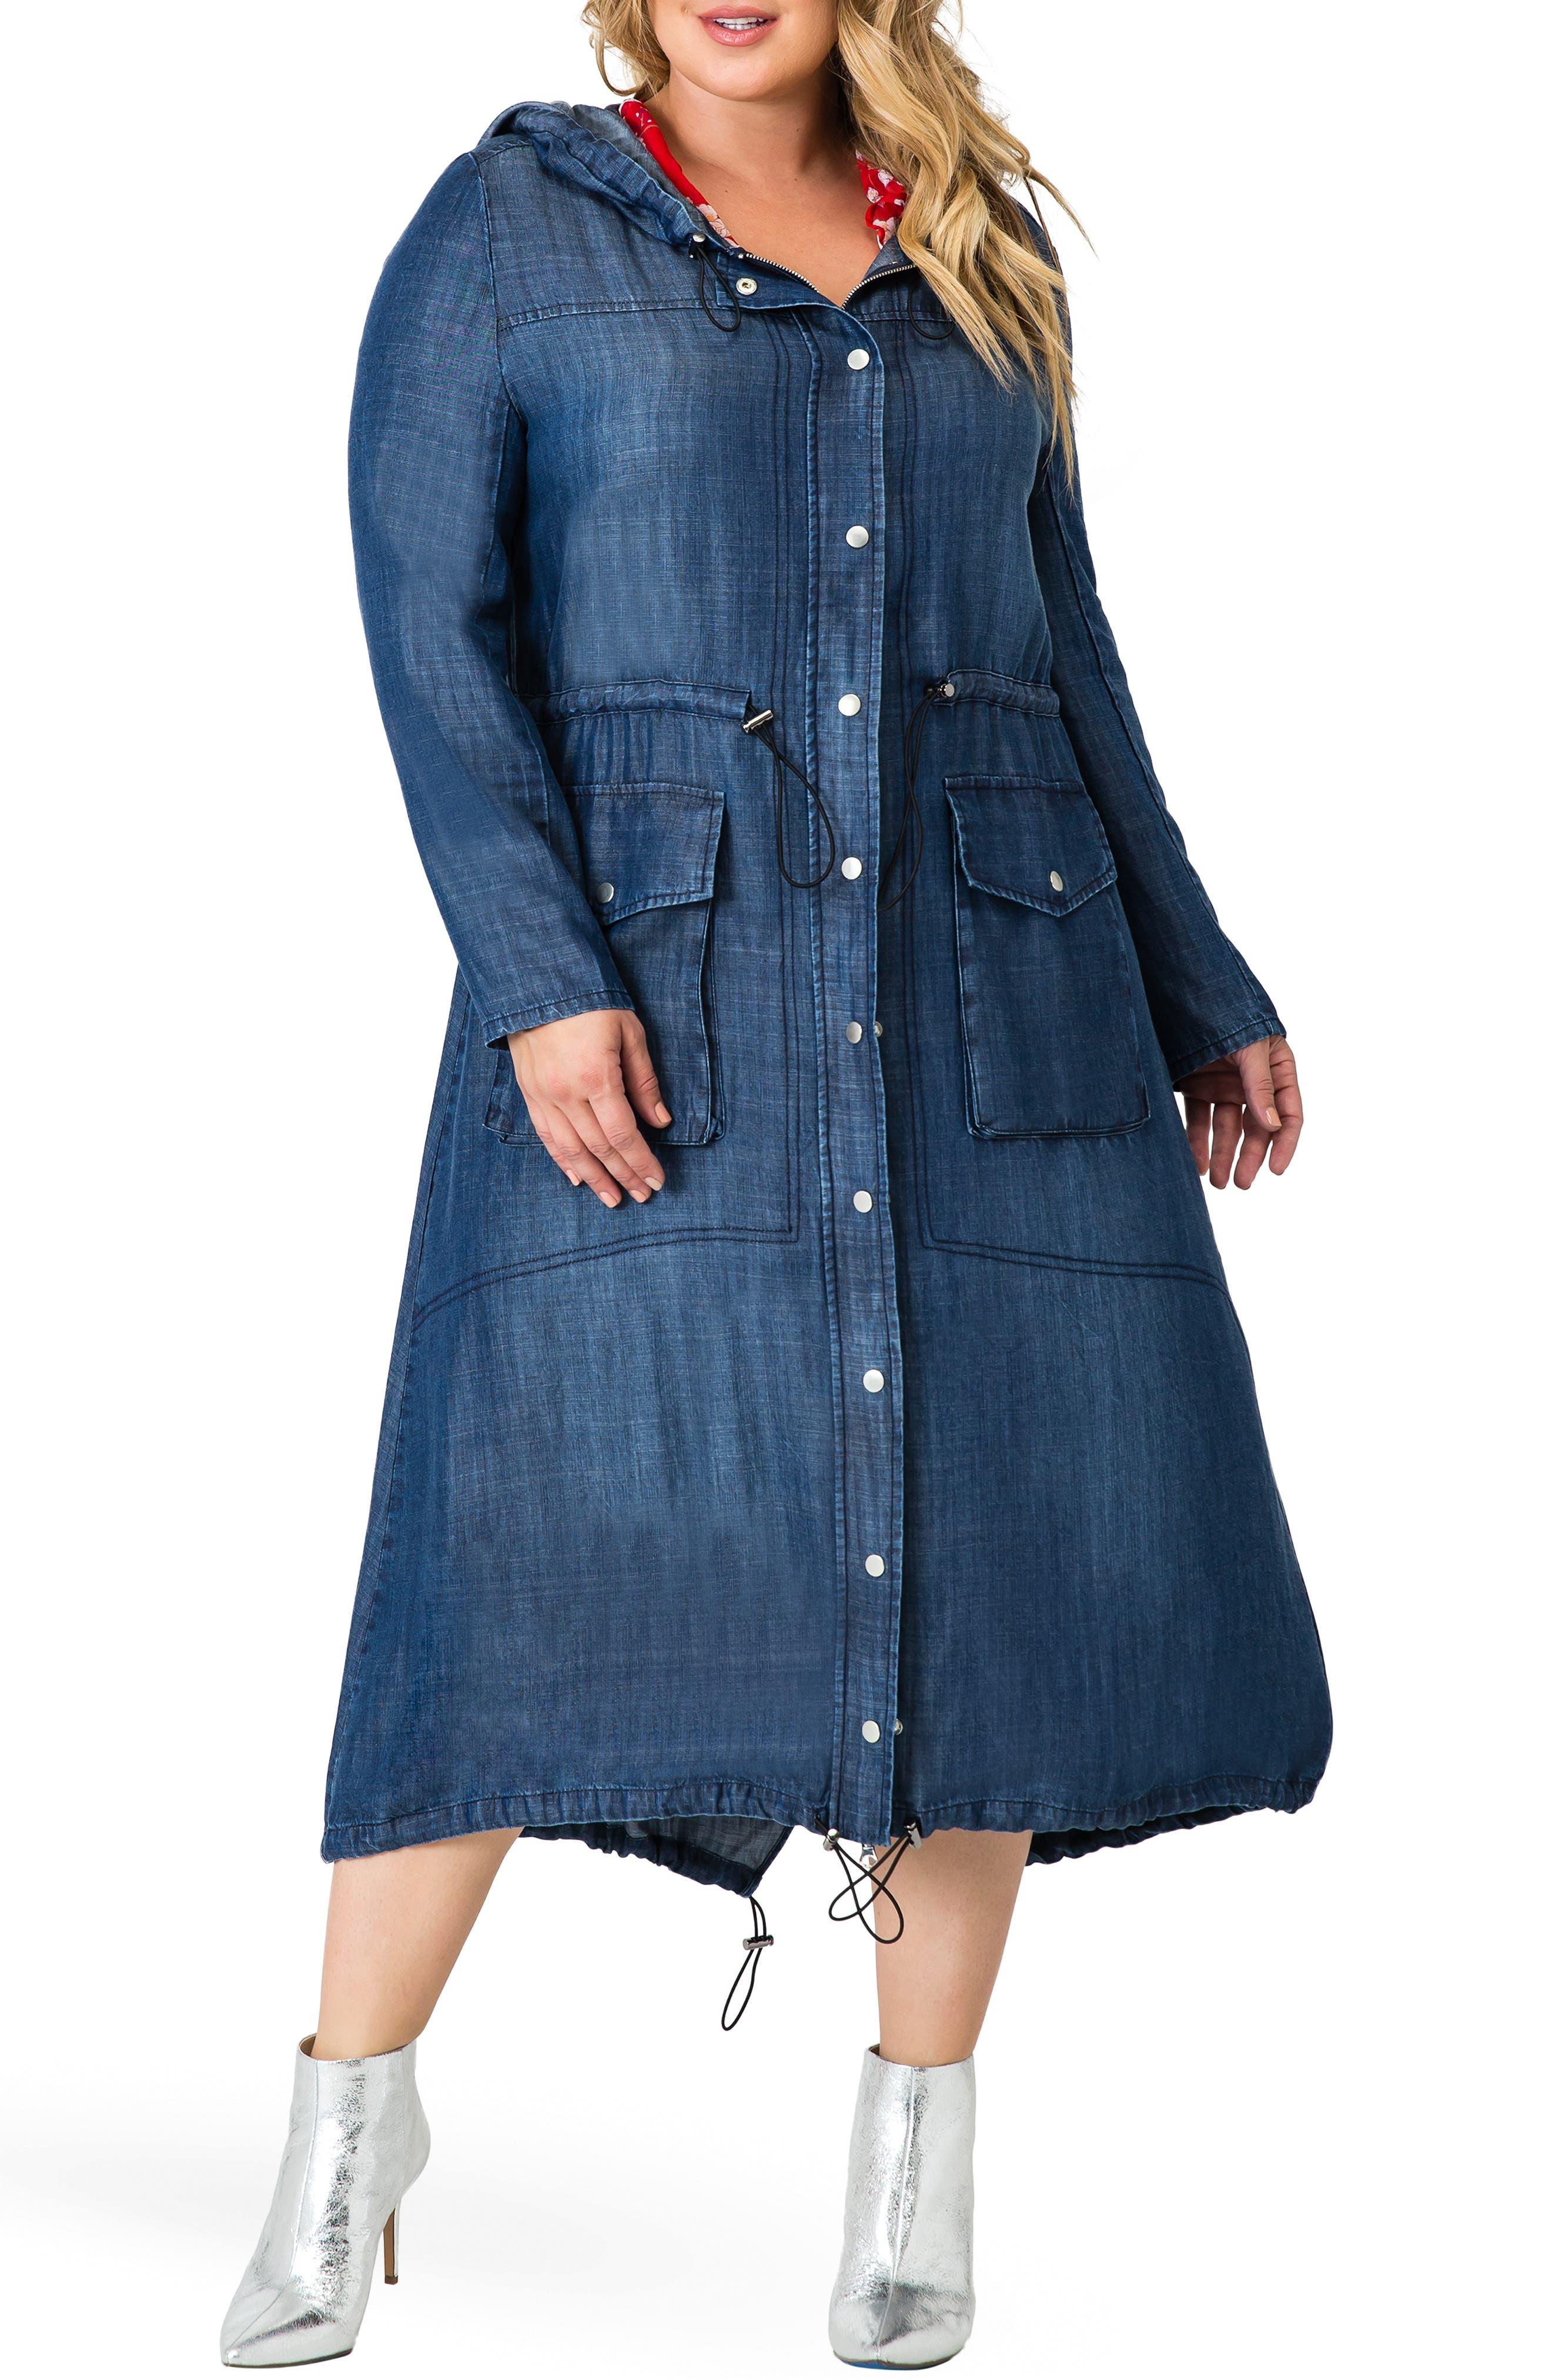 plus size women's standards & practices nova tencel hooded dress